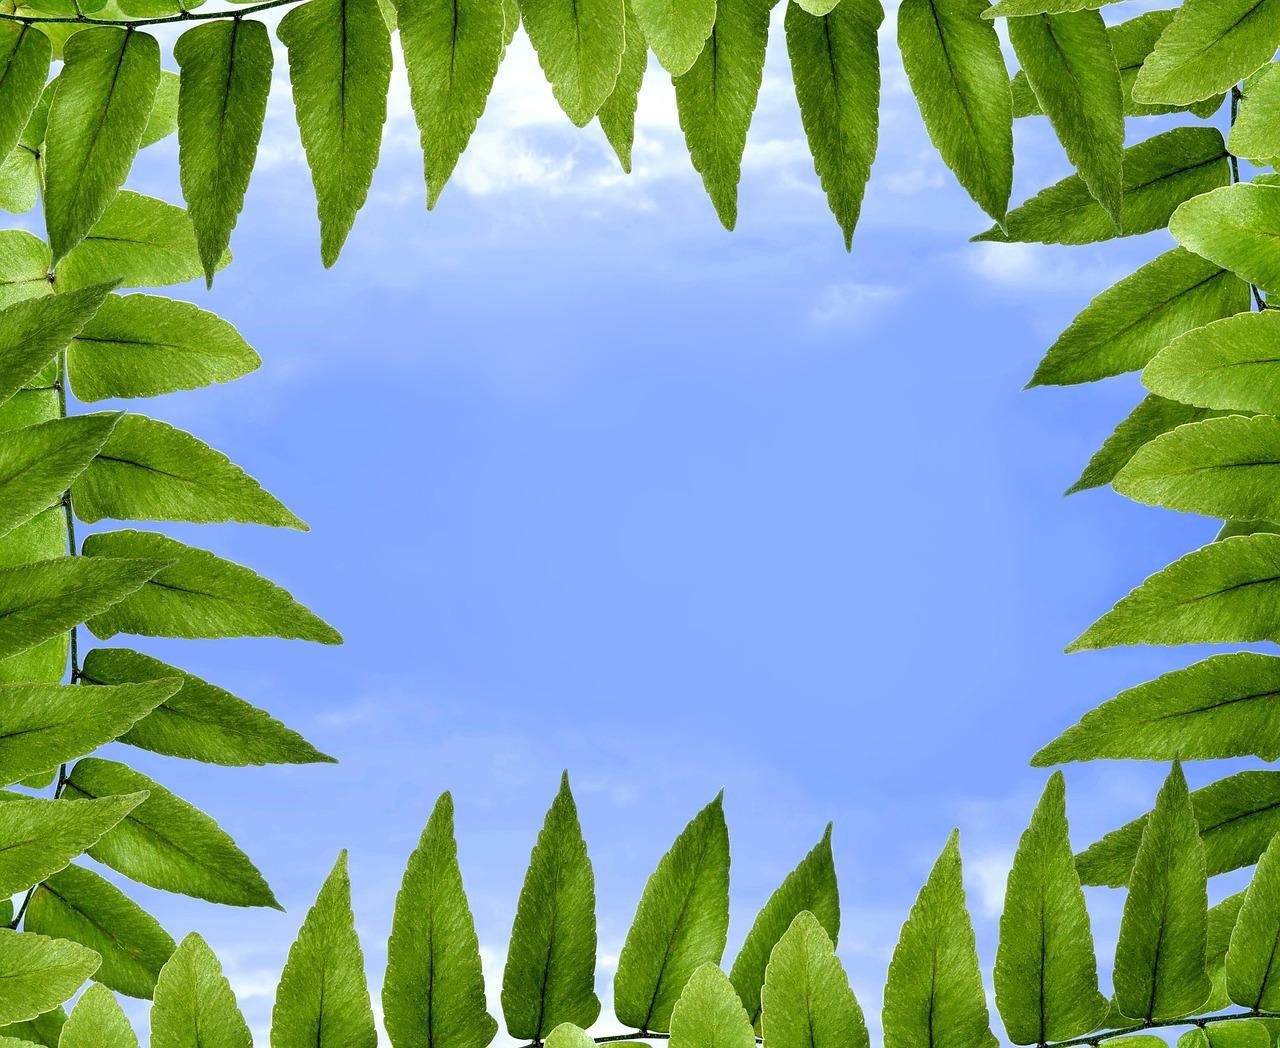 foliage-1278760_1280